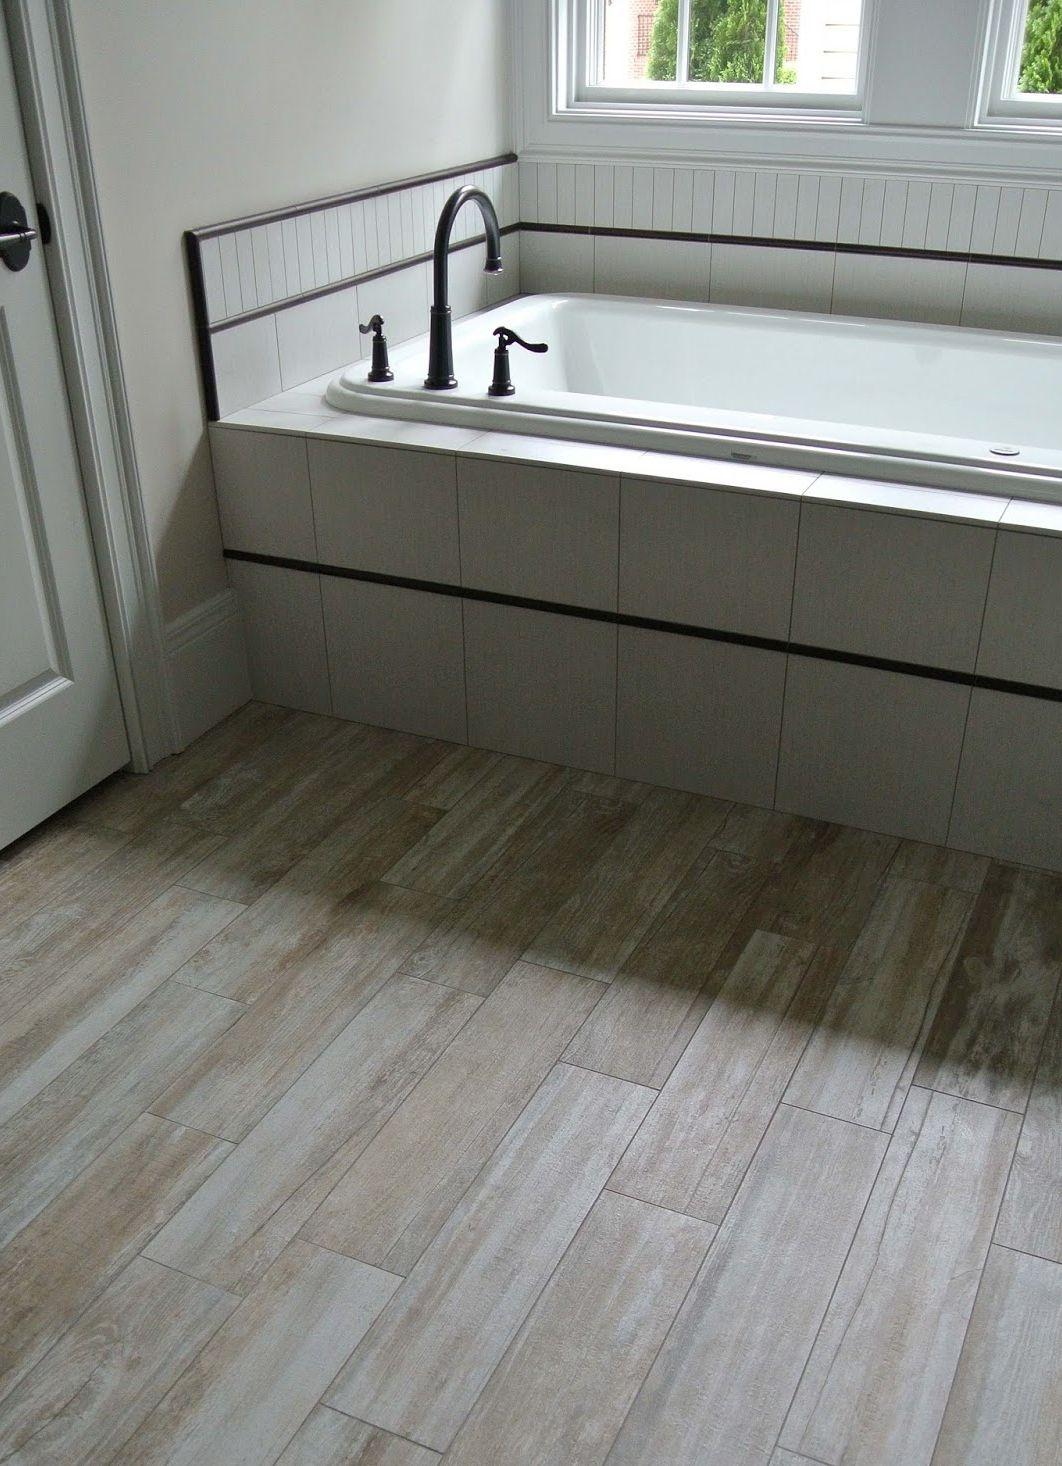 best floor tile ideas tile flooring ideas bathroom best ... TAEQKZM